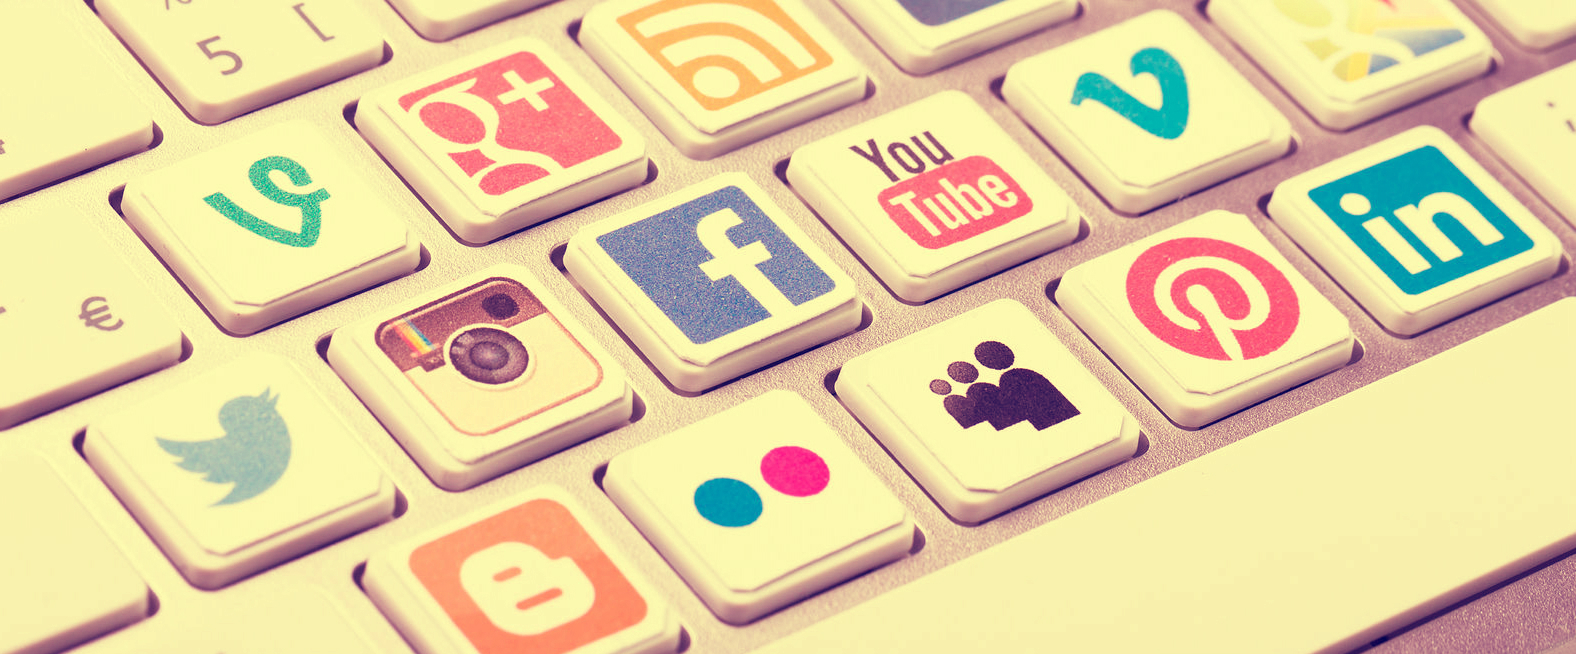 6 Key Advantages of Social Media Marketing Over Traditional Marketing